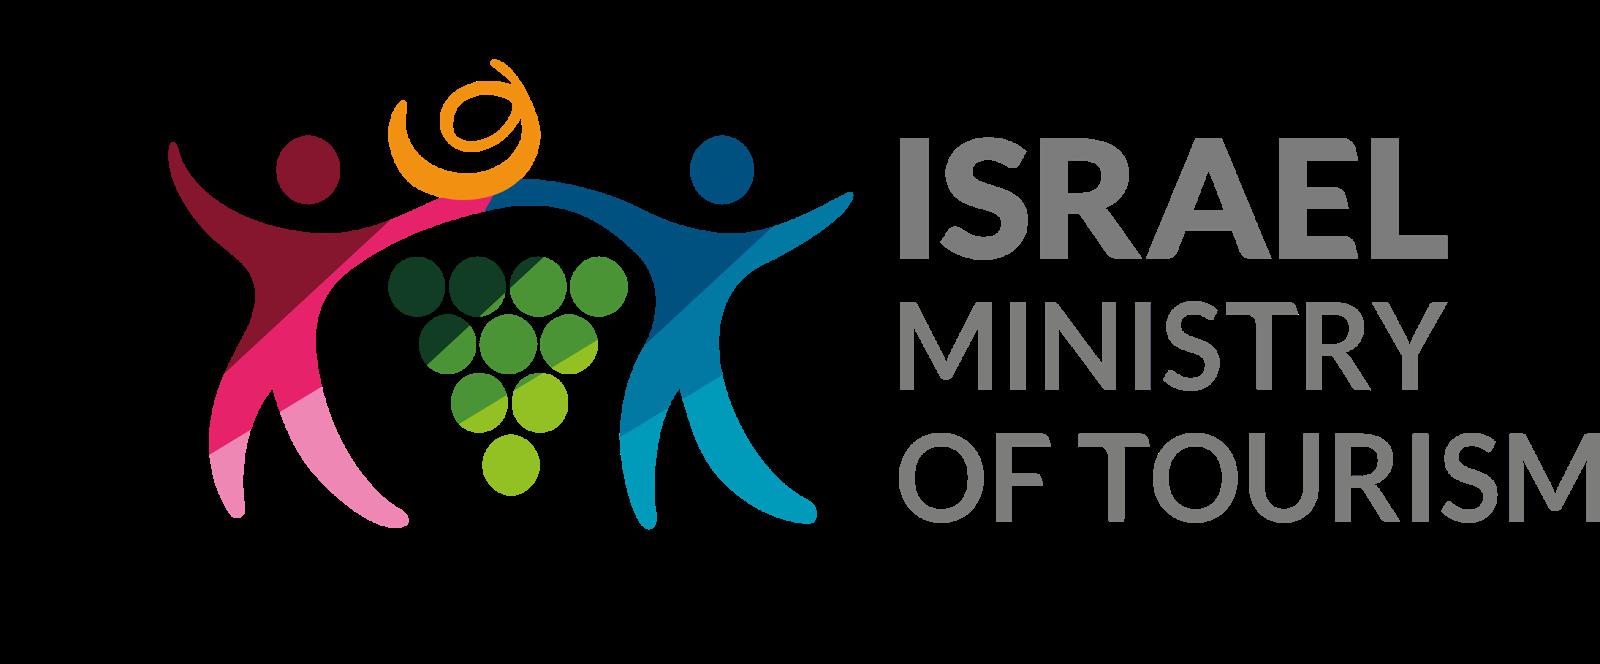 Лицензия министерства туризма